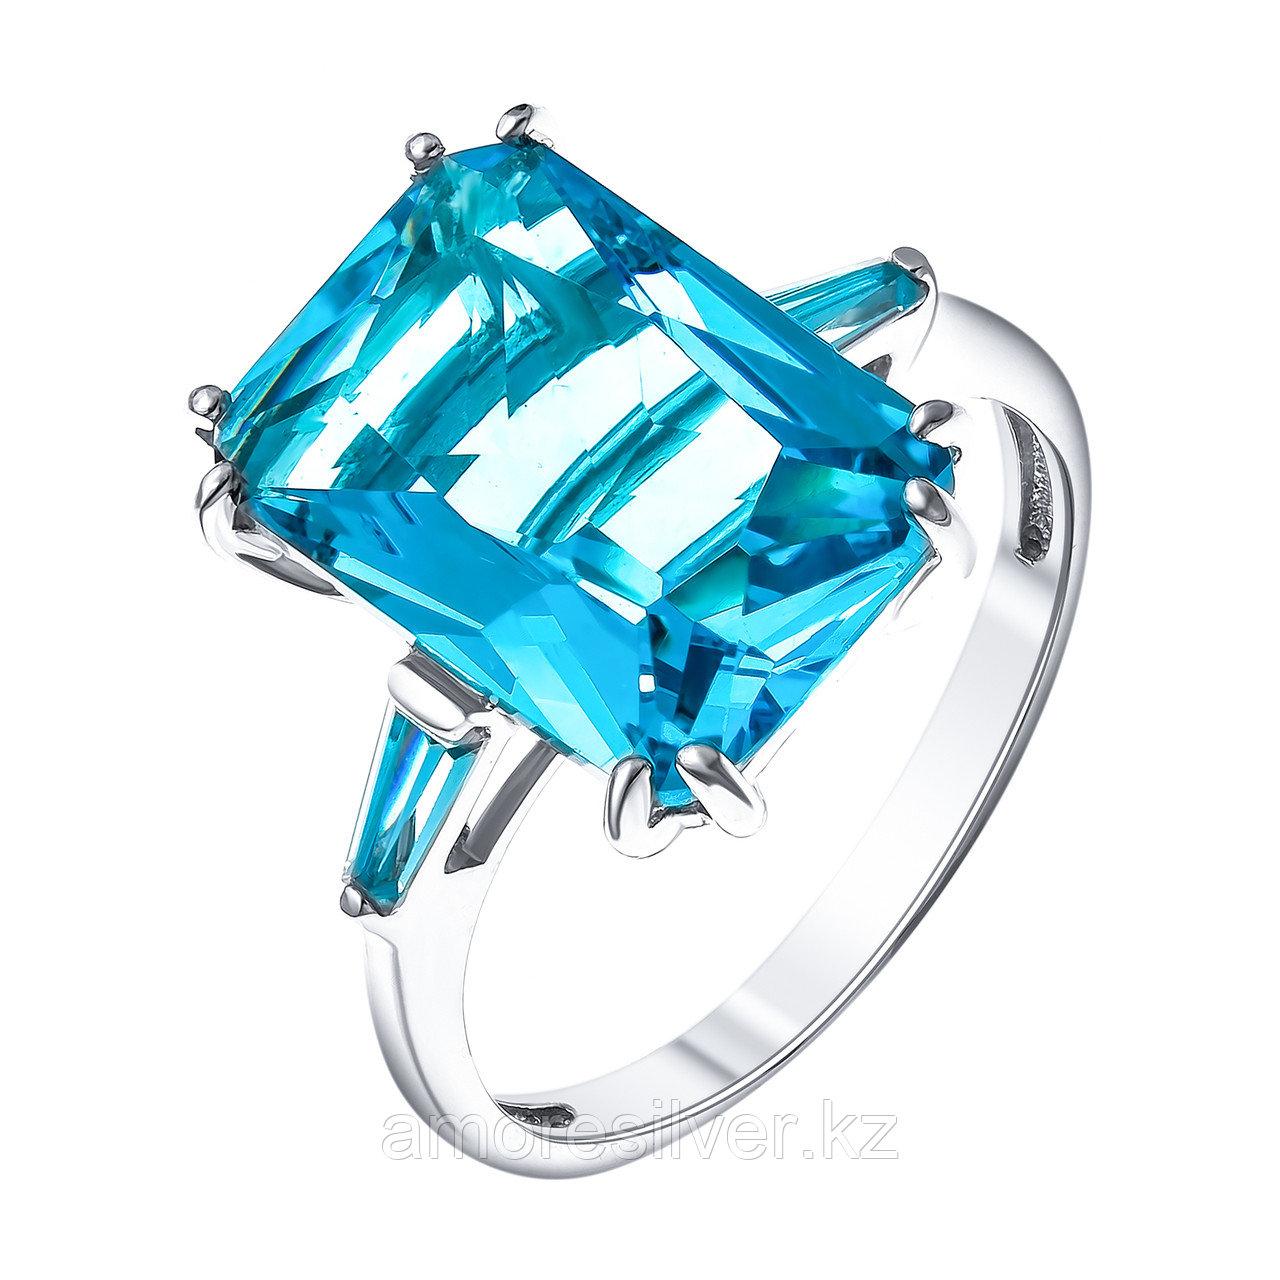 "Кольцо Teosa серебро с родием, фианит, ""halo"" 100-1292-ТС"